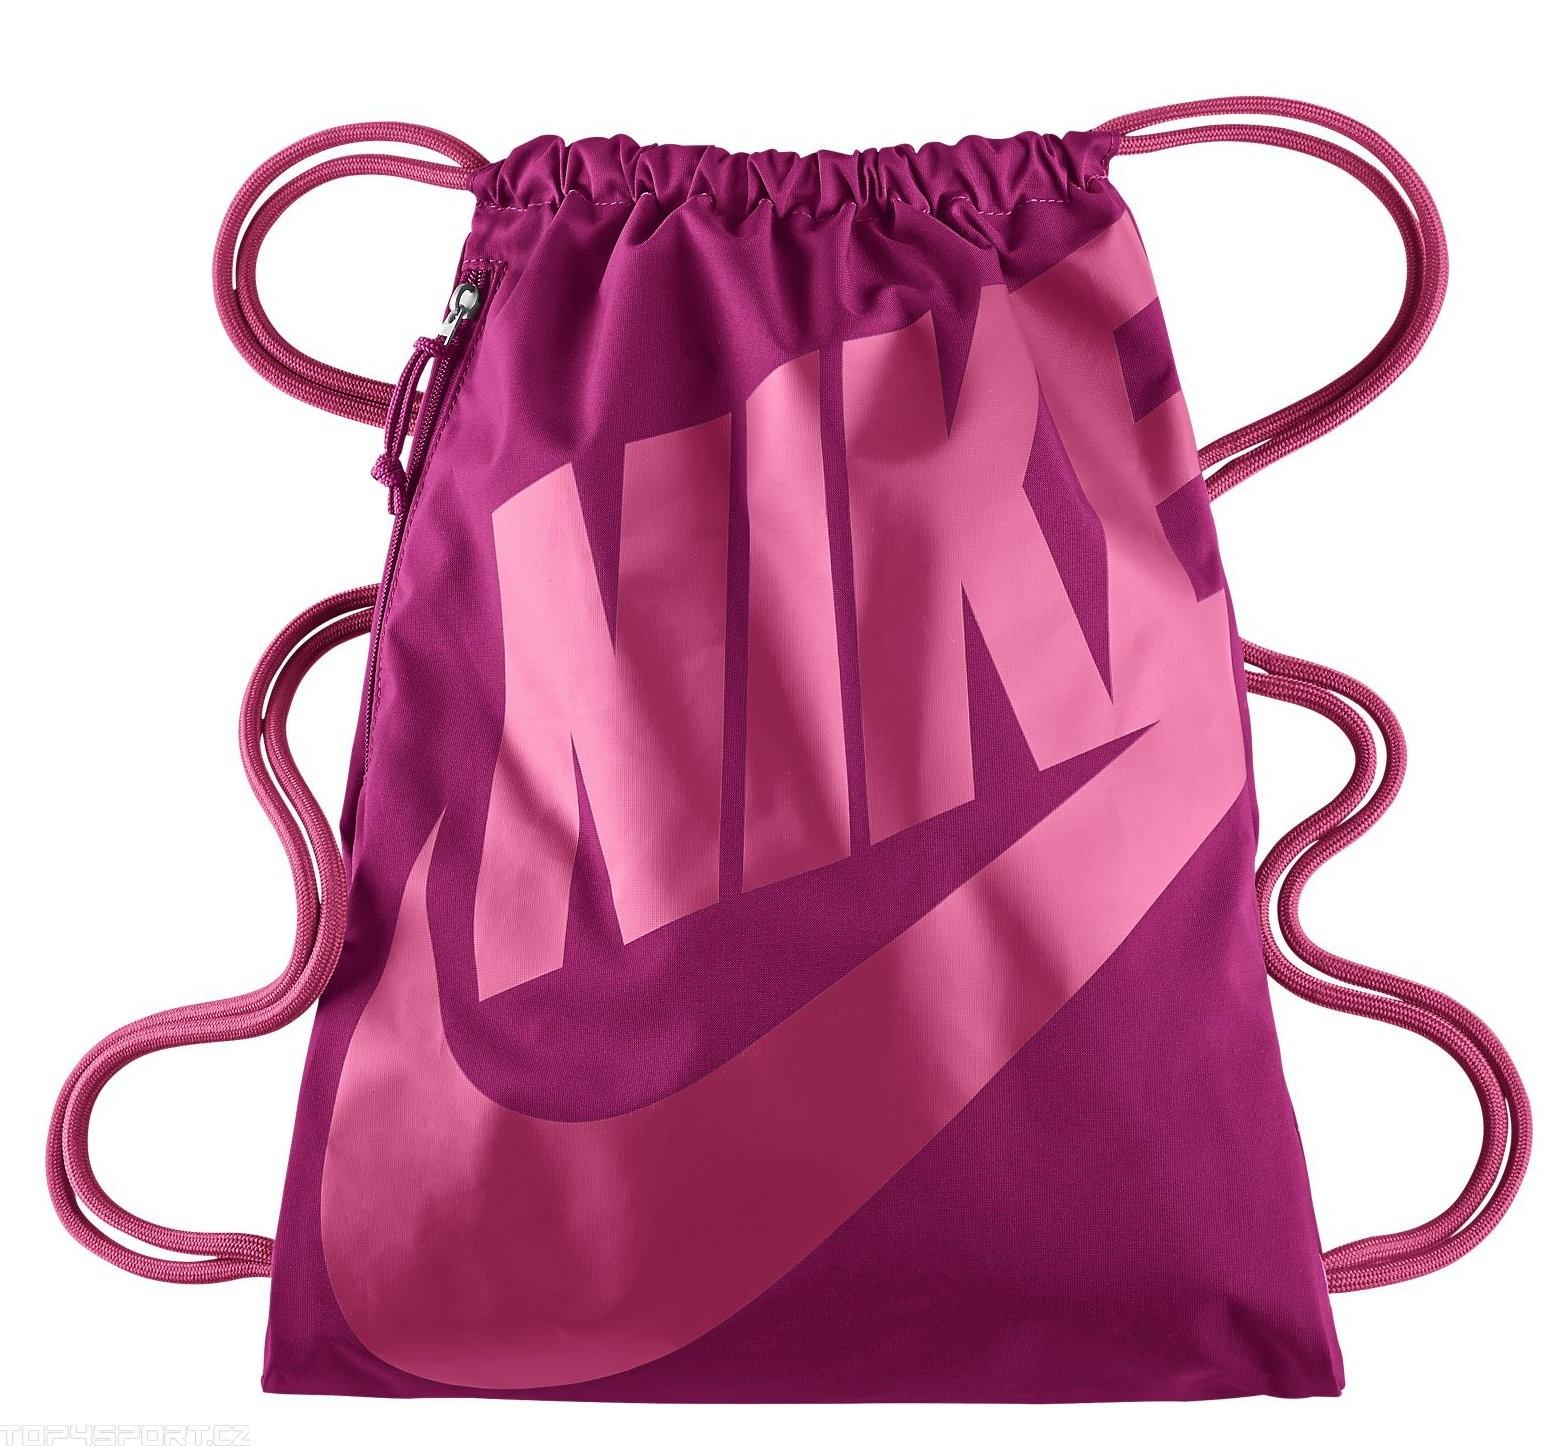 new product 6b394 11399 Nike Heritage Gymsack Fuchsia Pink